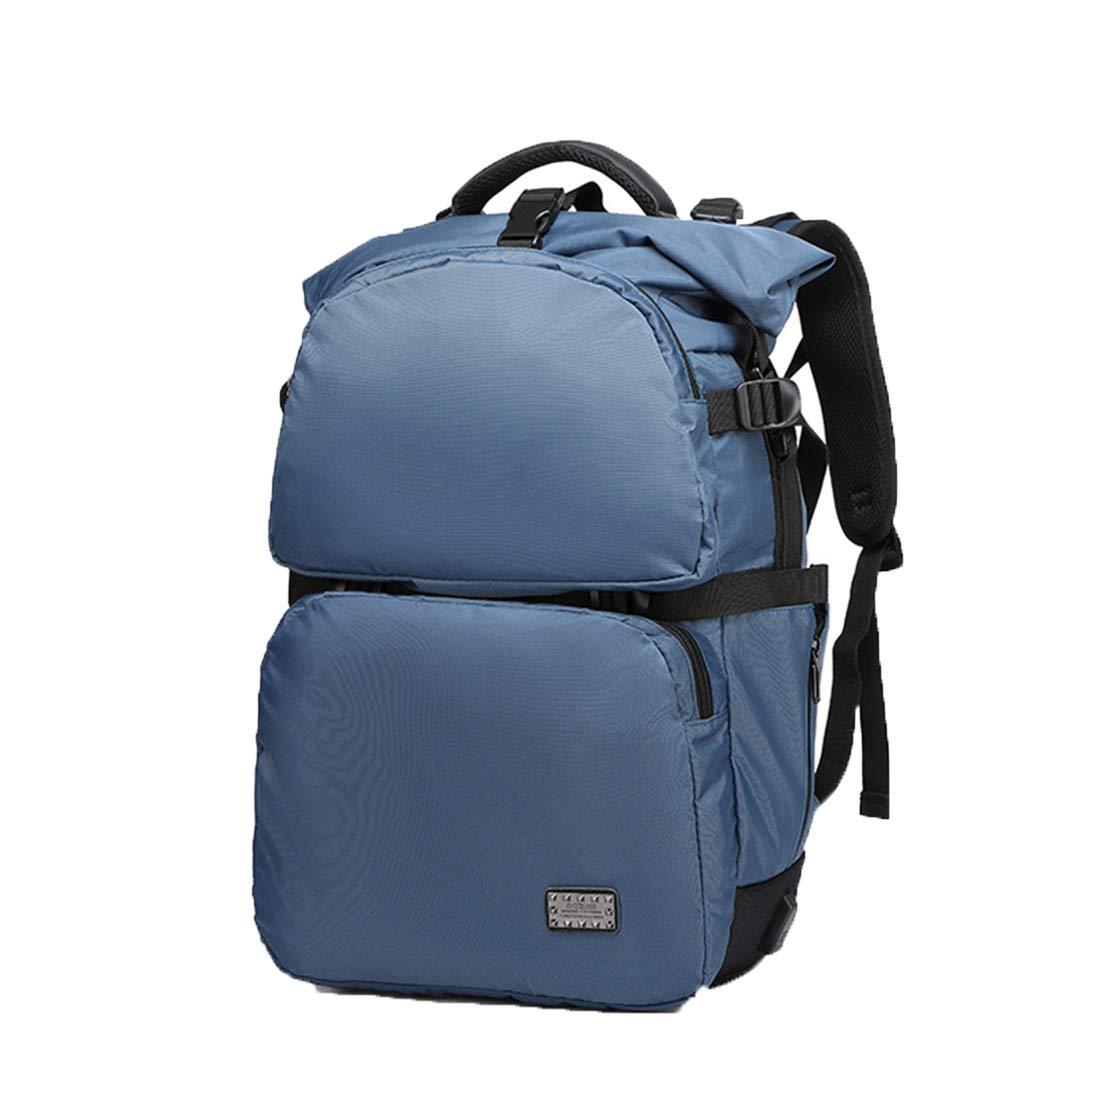 Xiying Trendy Laptop Rucksack USB Faltbar Casual Casual Casual Daypack Herren Nylon Handtasche Outdoor Reiserucksack Sporttasche Groß B07KP5T8FX Wanderruckscke Primäre Qualität 045b9d